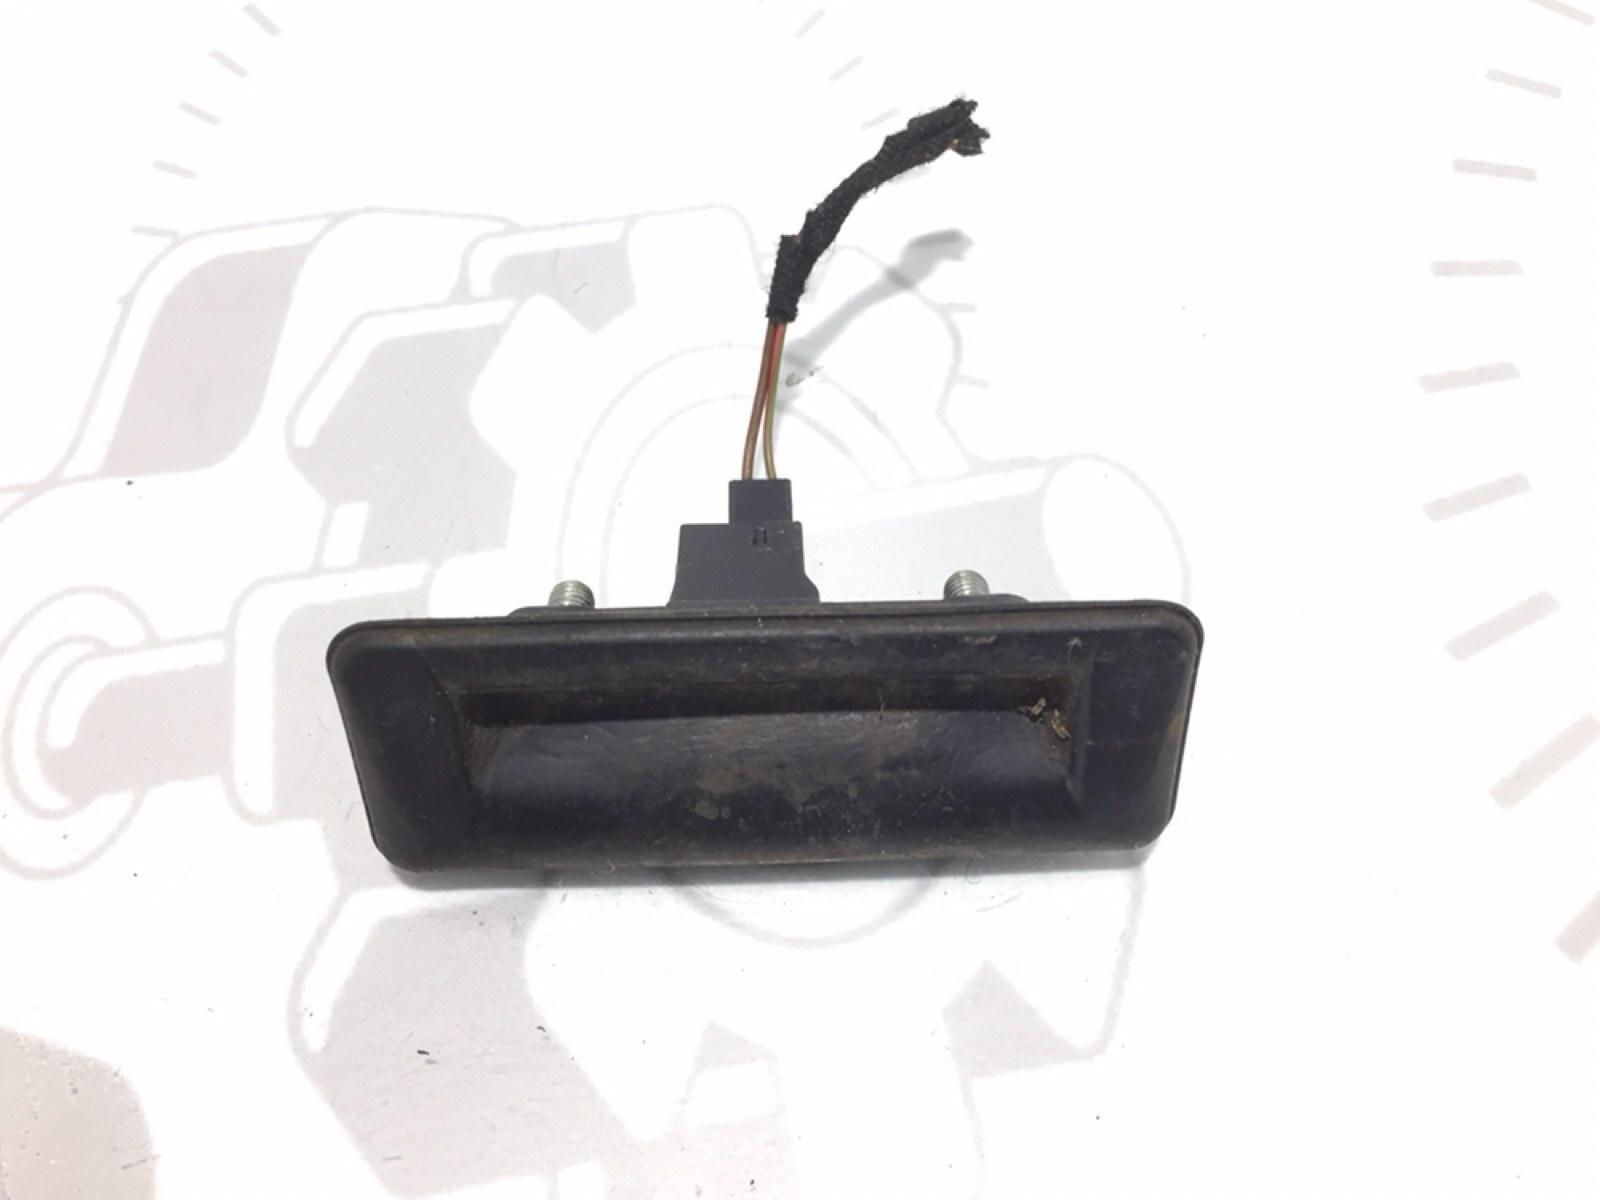 Кнопка открытия багажника Skoda Roomster 5J 1.4 TDI 2008 (б/у)